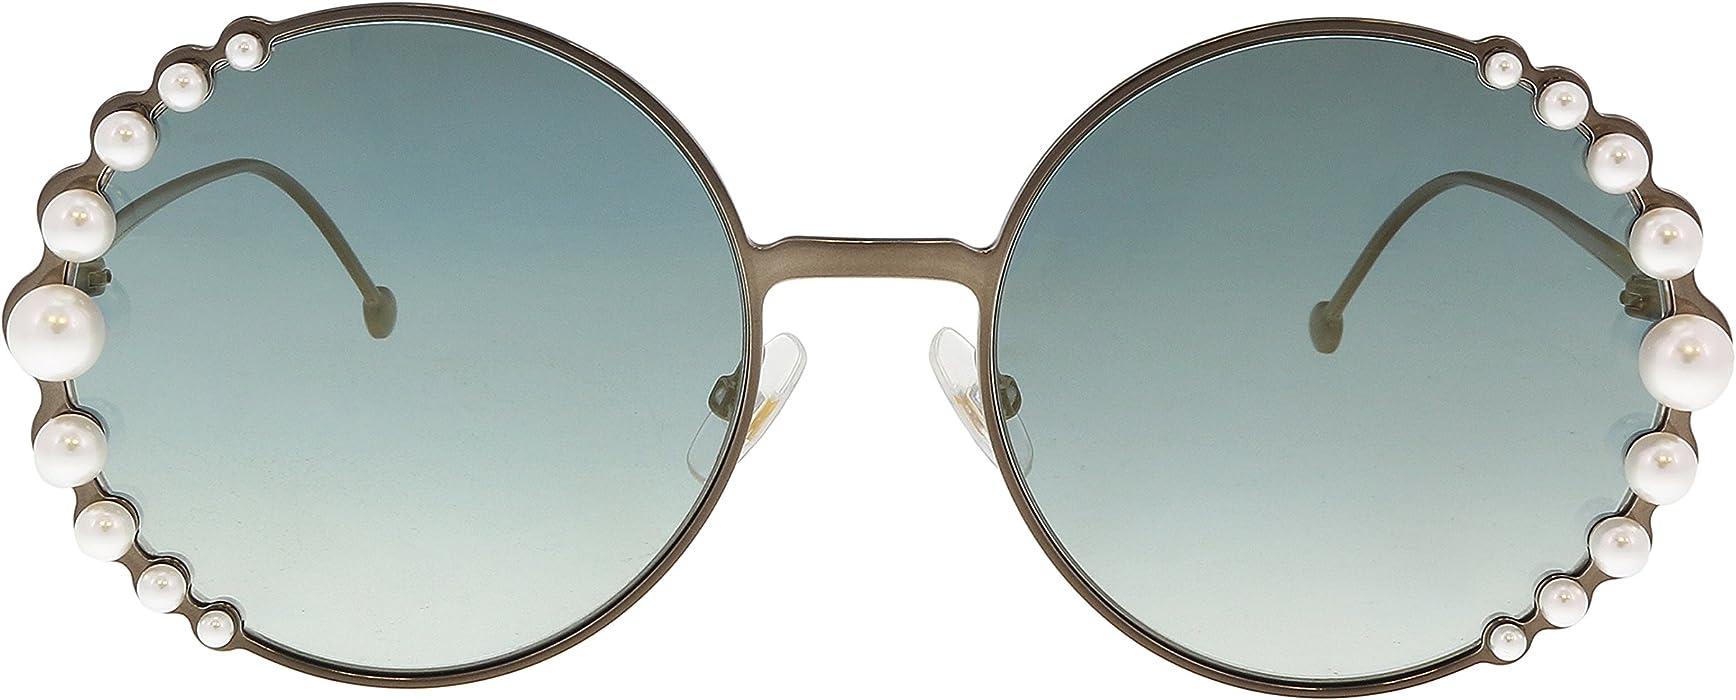 b673c3948d97 Sunglasses Fendi Ff 295  S 0J7D Semi Matte Bronze   EZ green silver mirror  lens